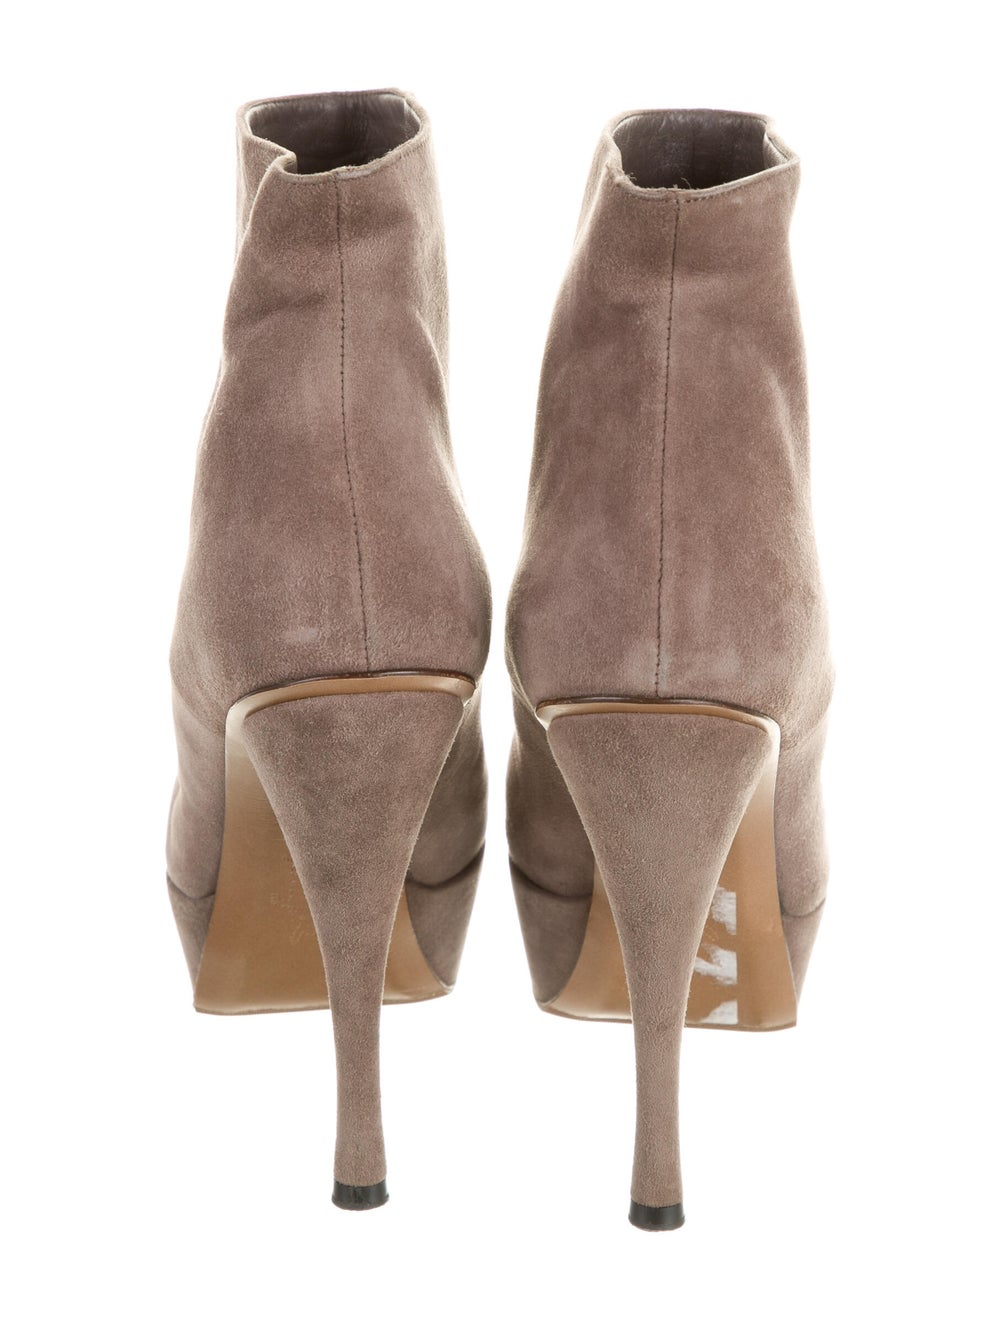 Marni Boots - image 4